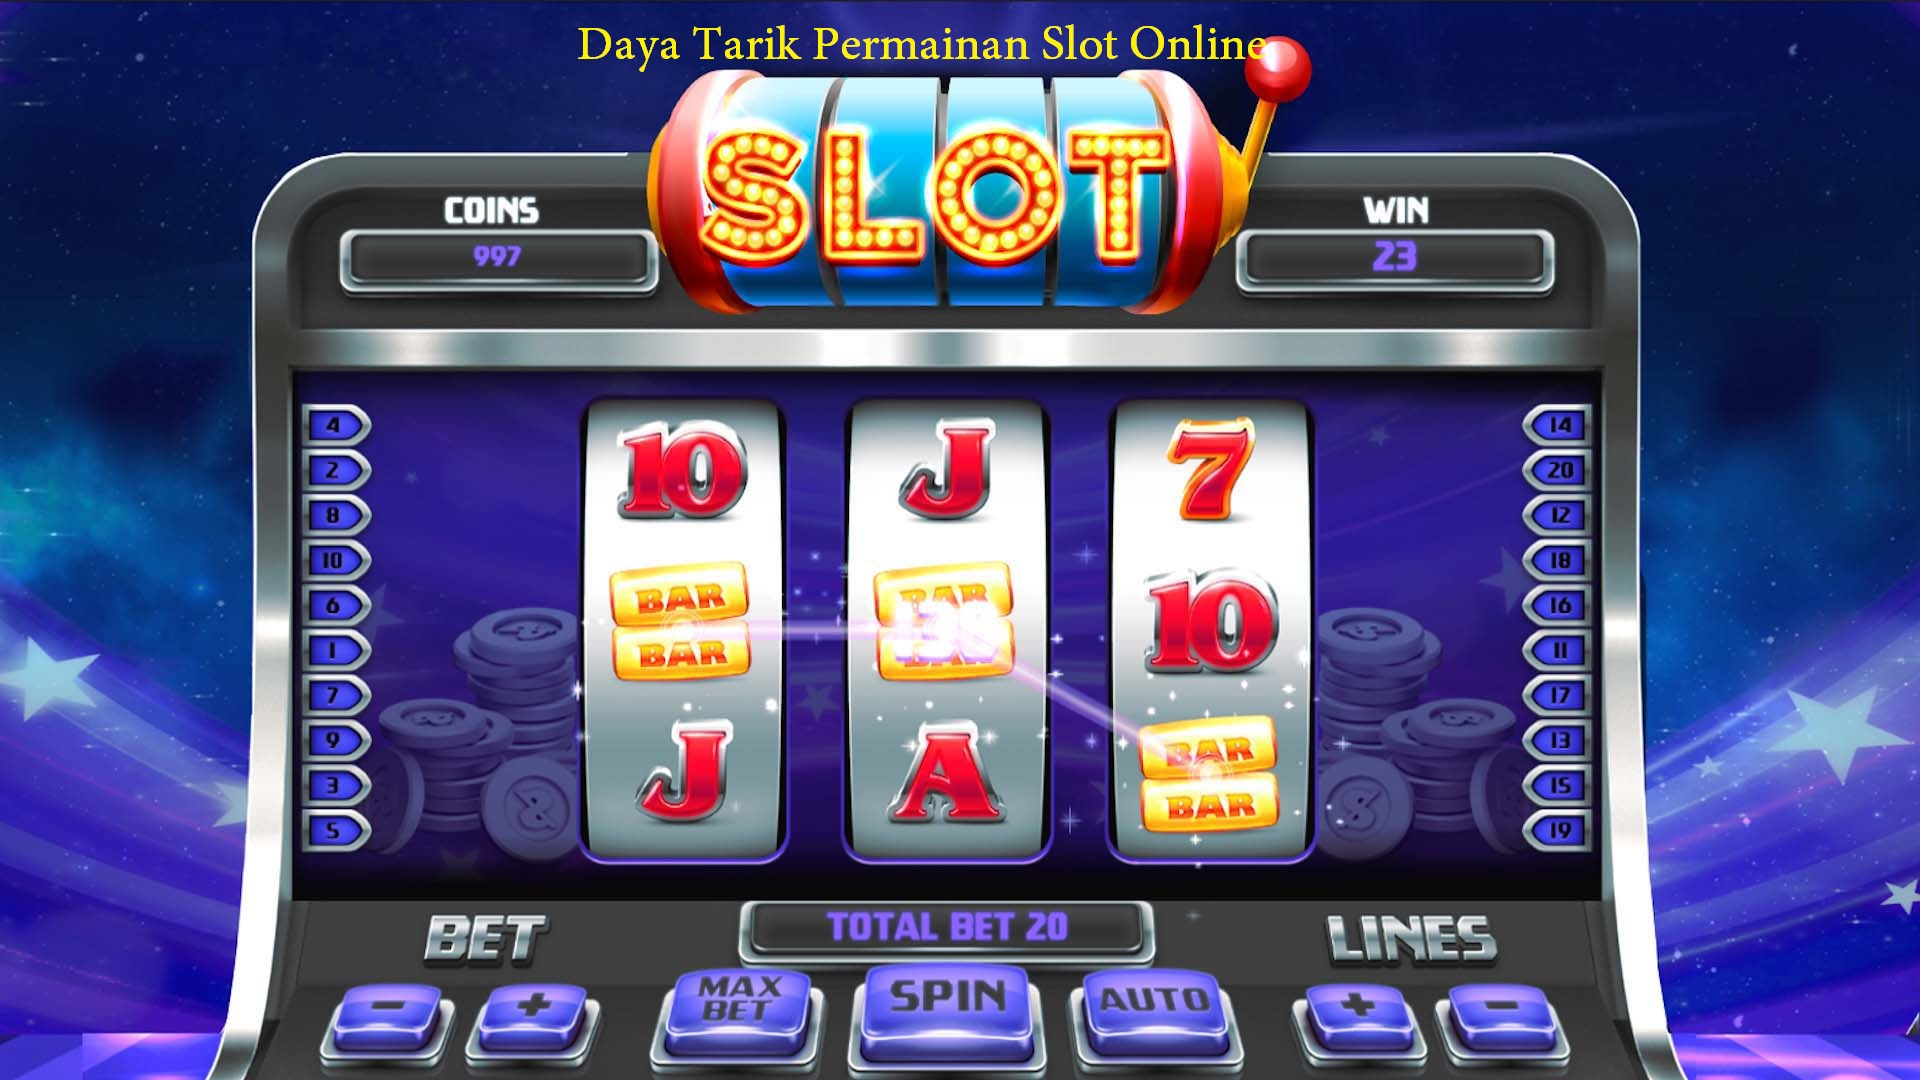 Daya Tarik Permainan Slot Online